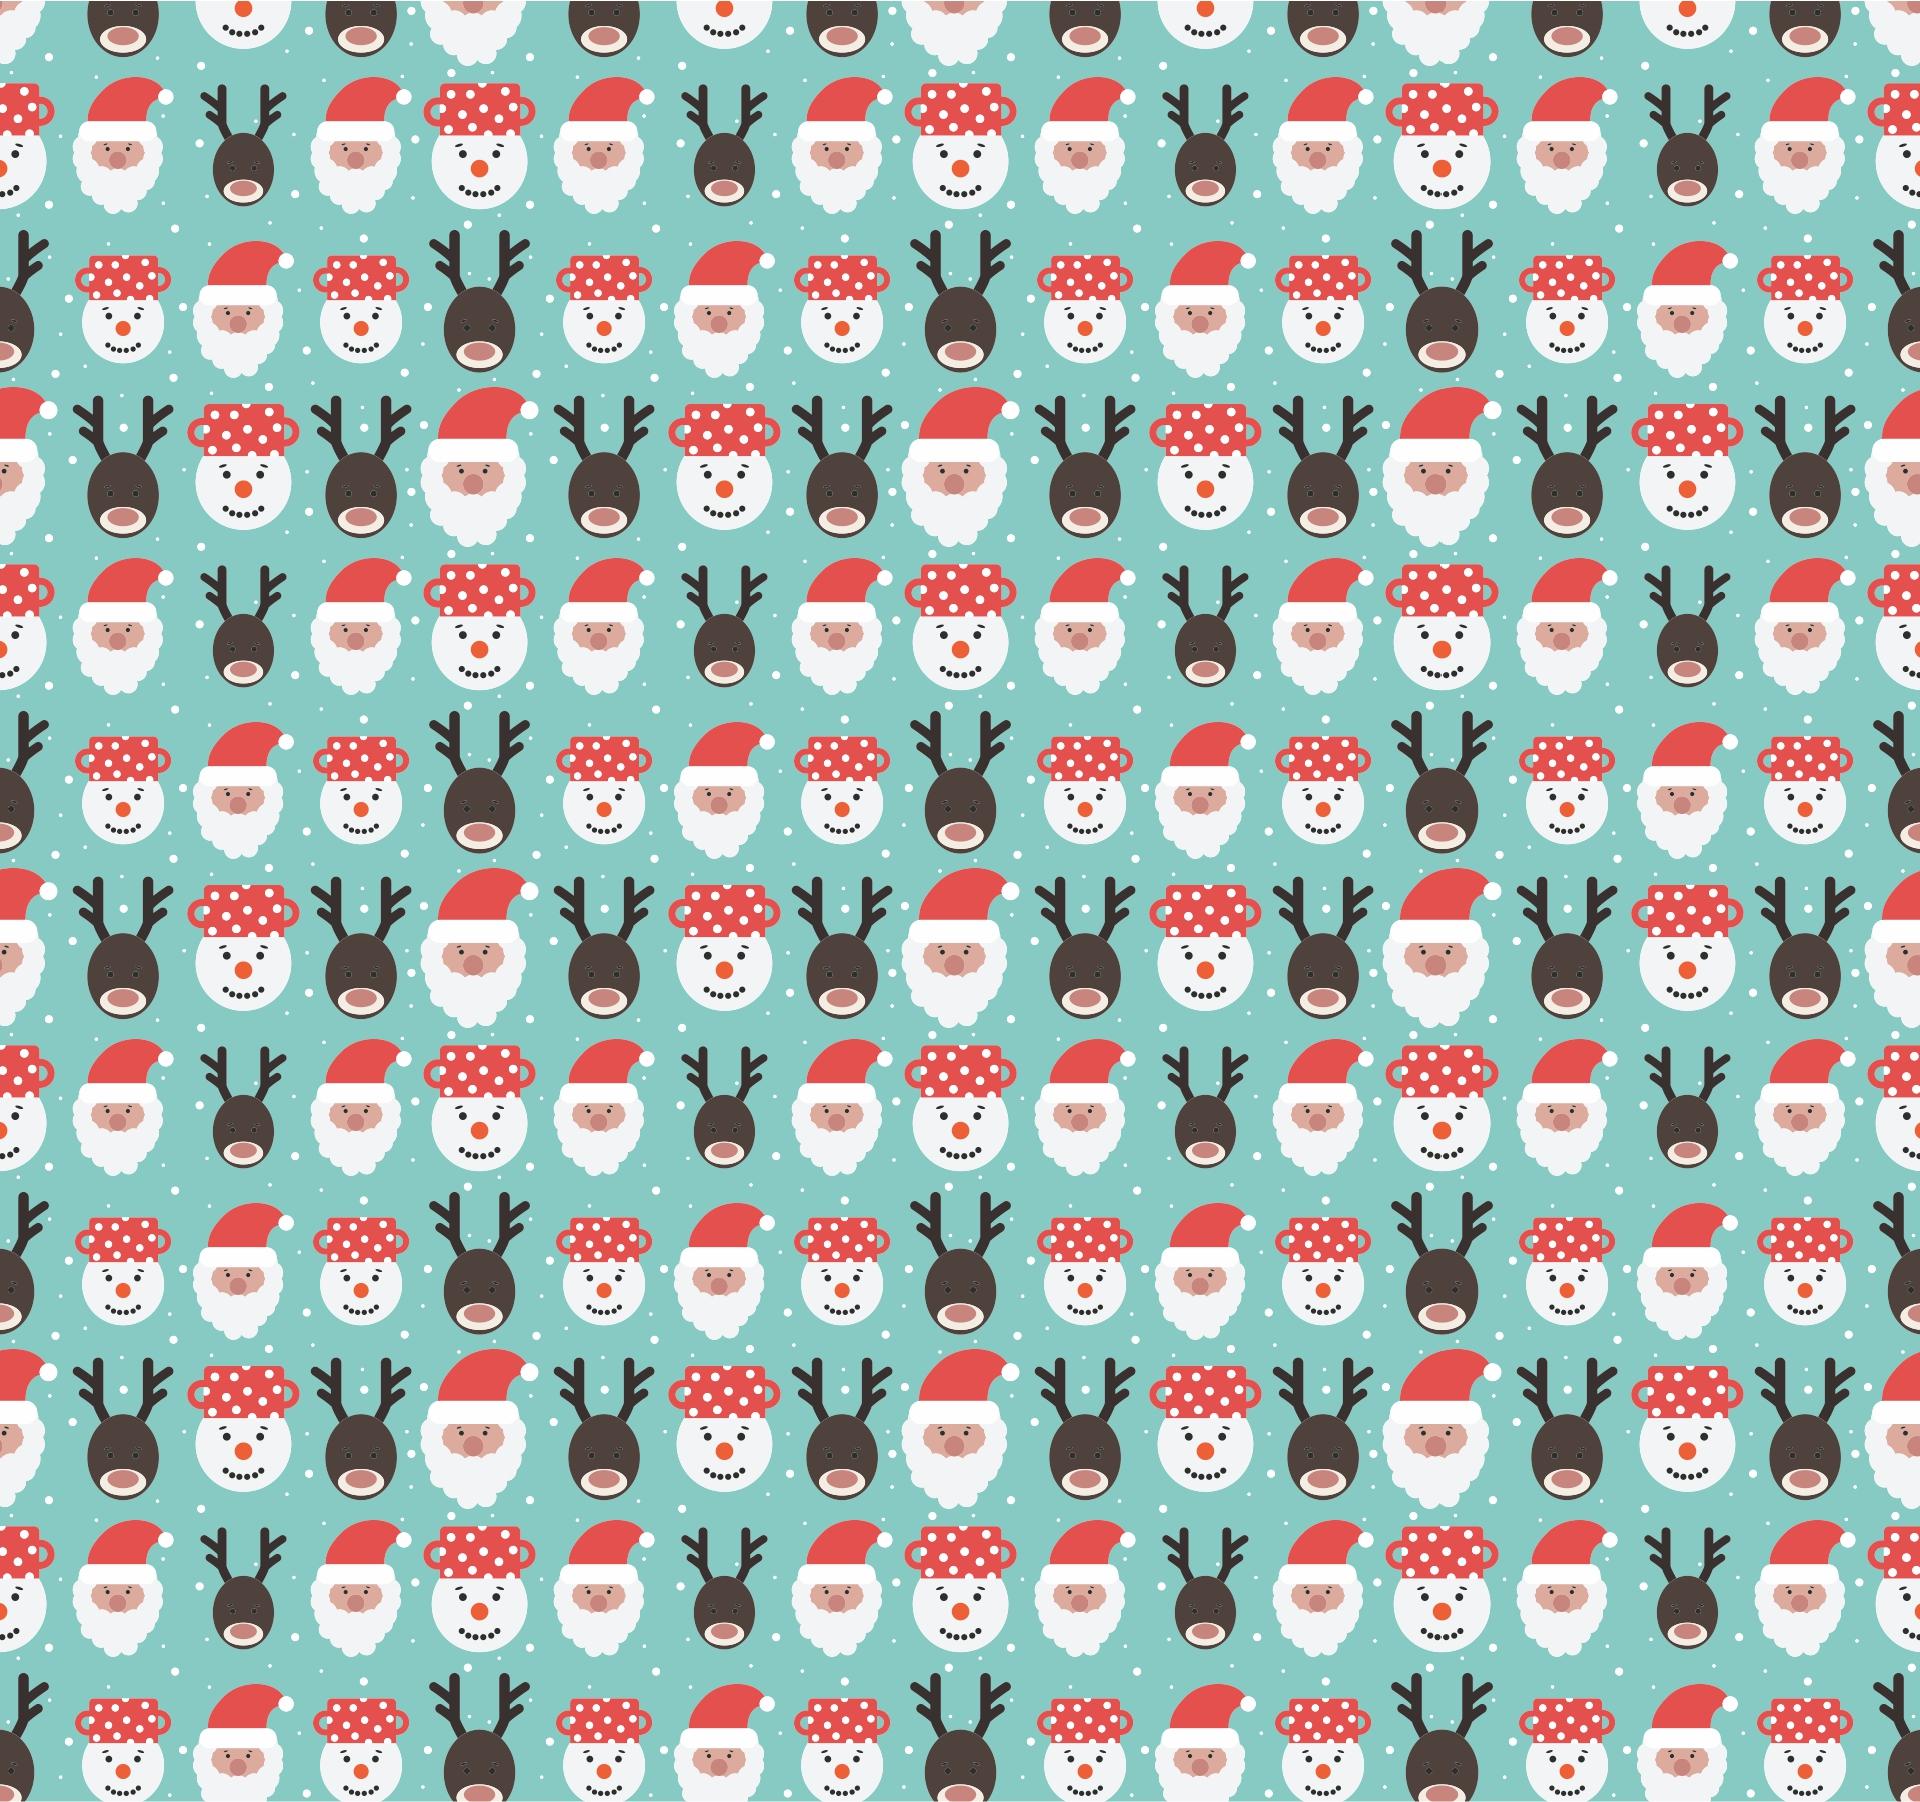 Reindeer Face Pattern